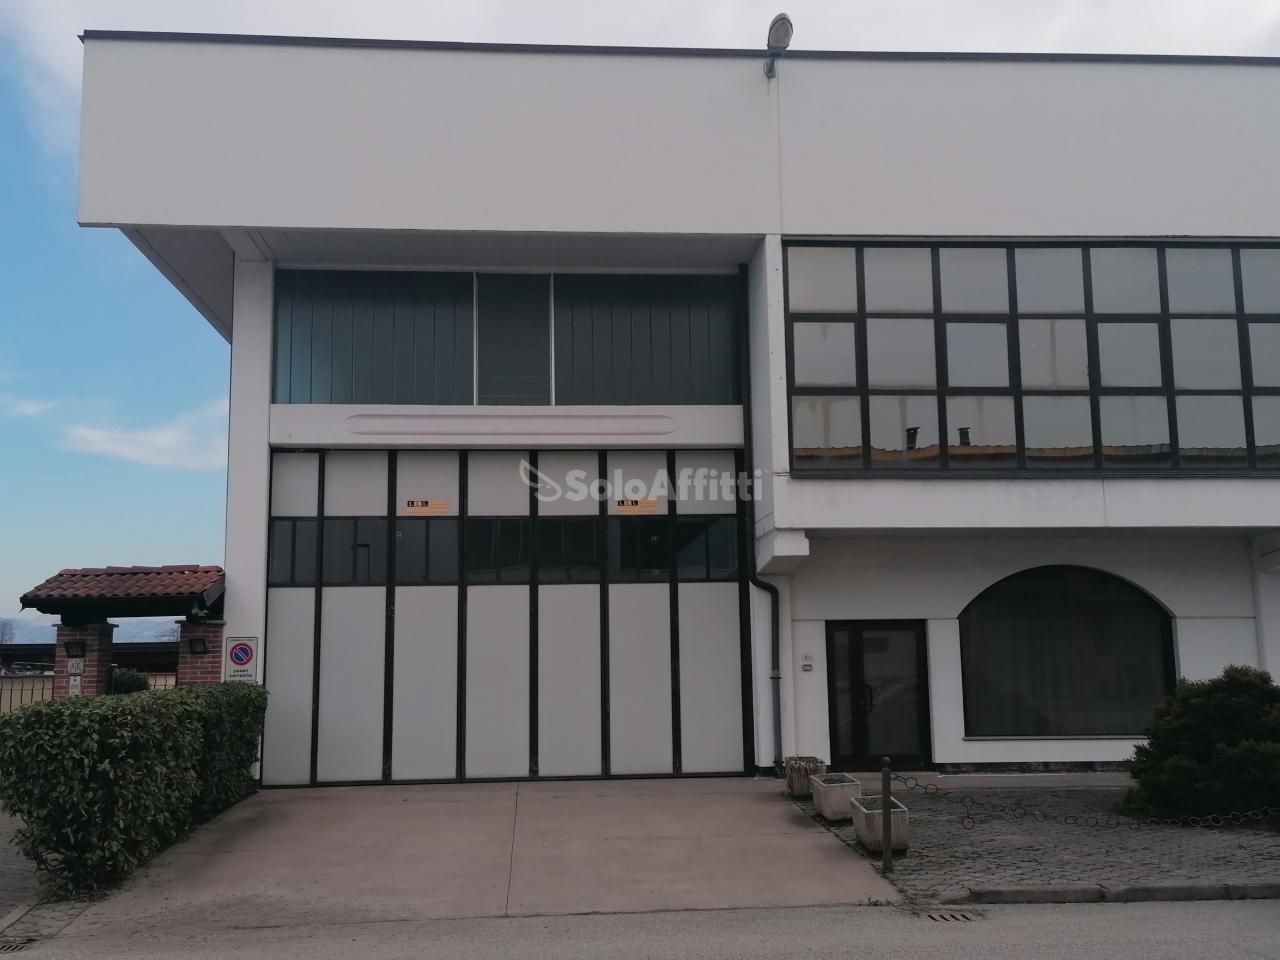 Magazzino in affitto a Cuneo (CN)